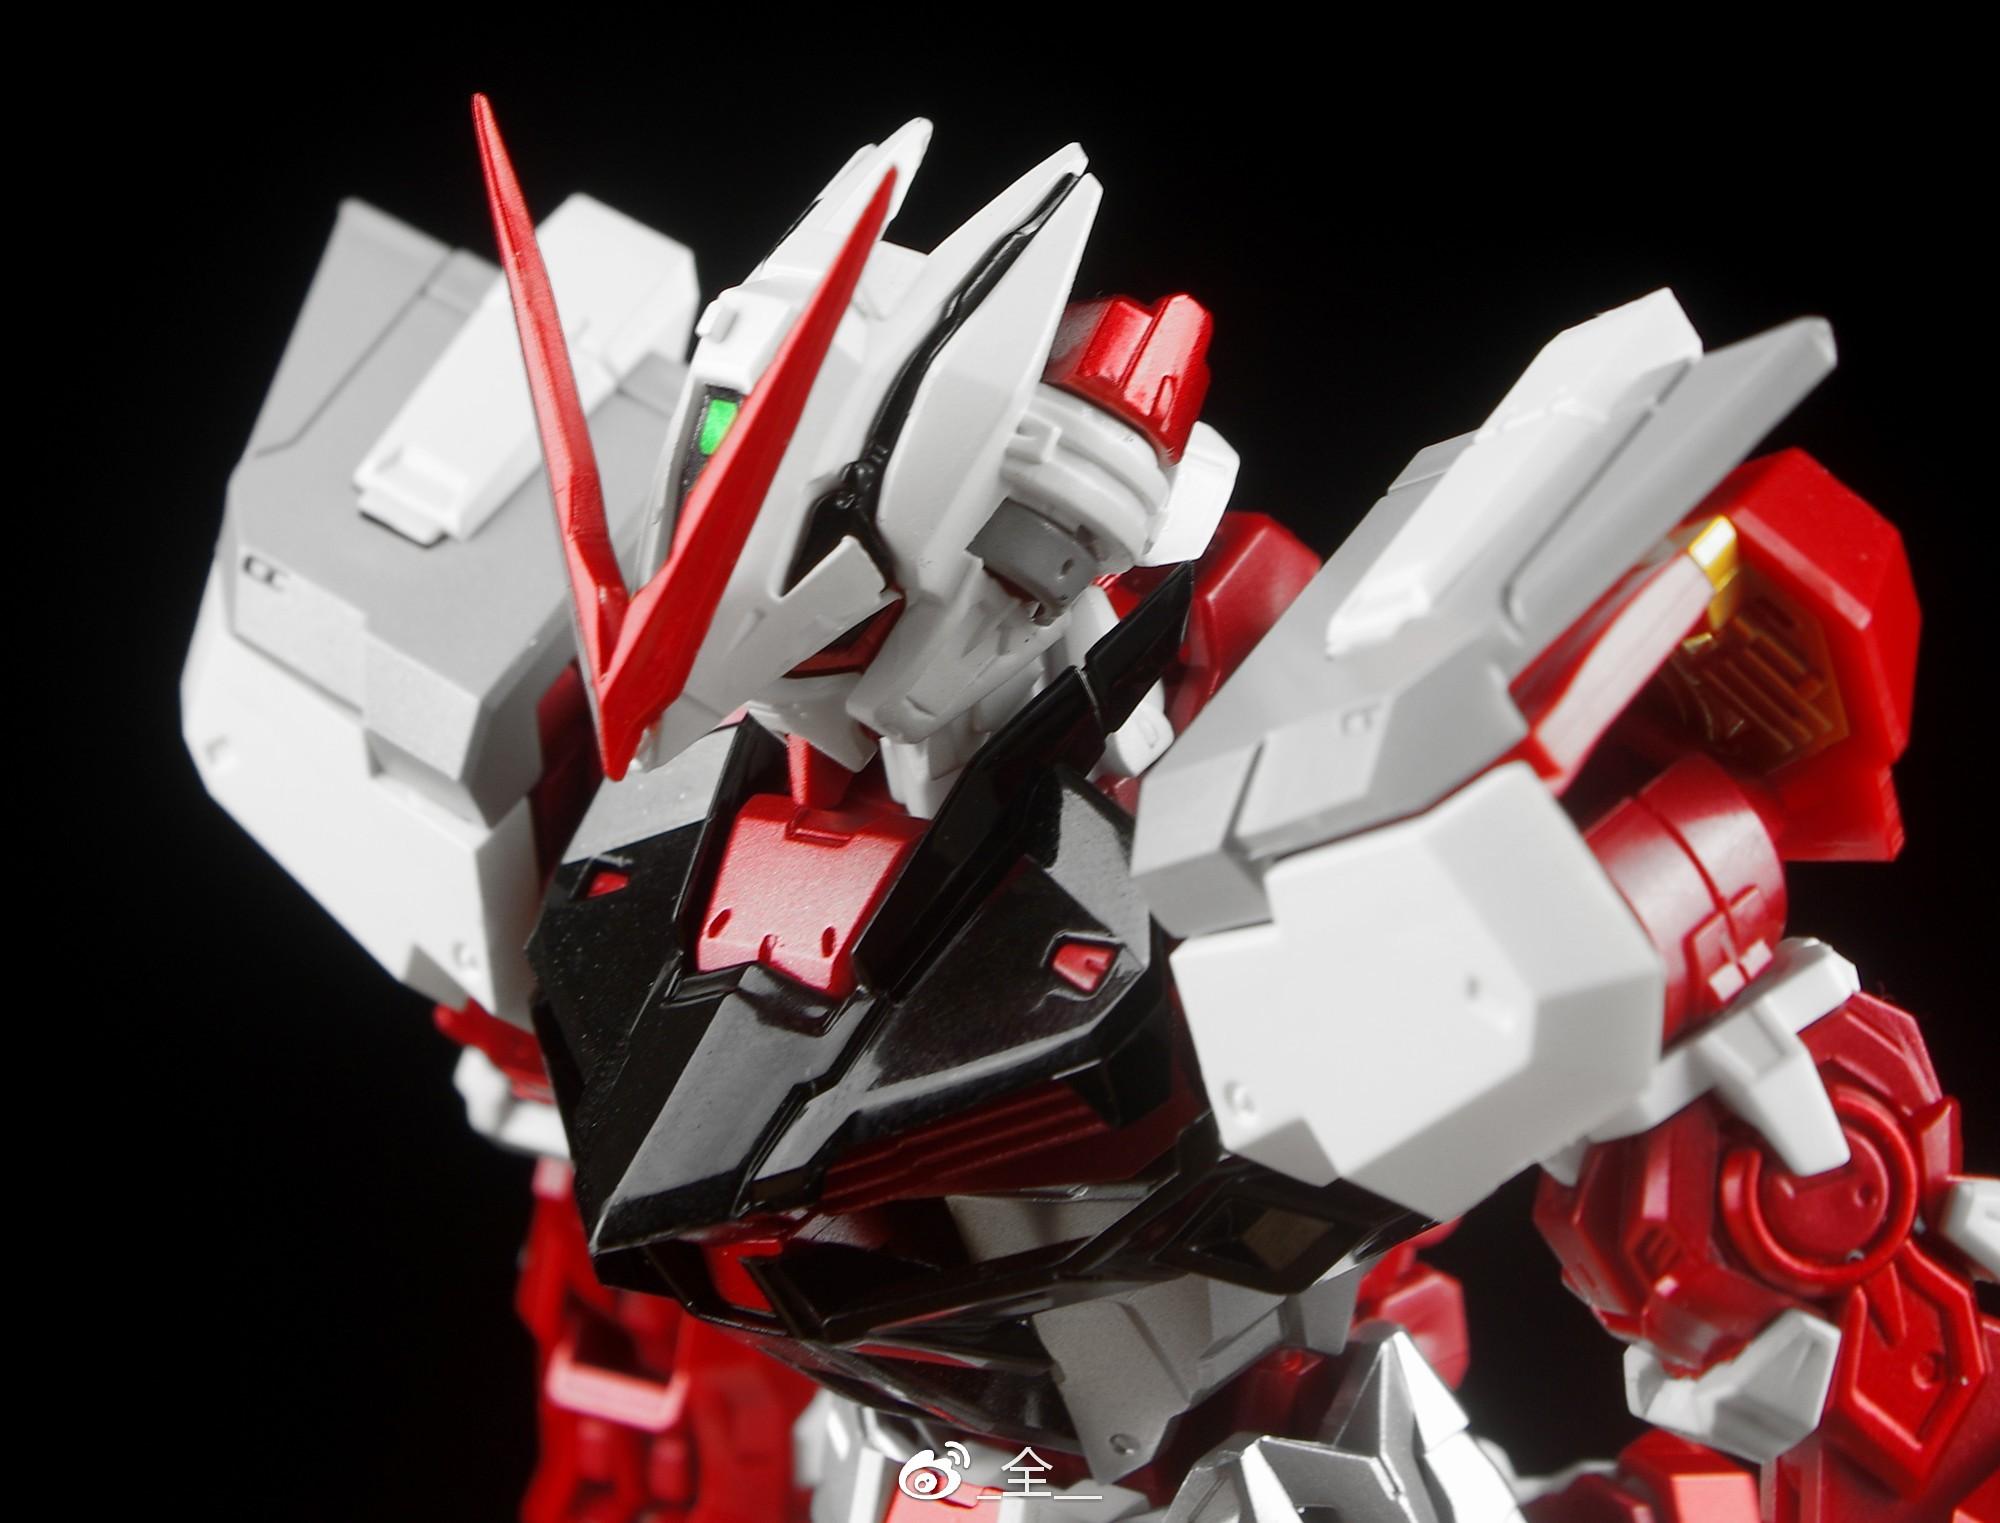 S246_3_MG_astray_red_kan_inask_030.jpg